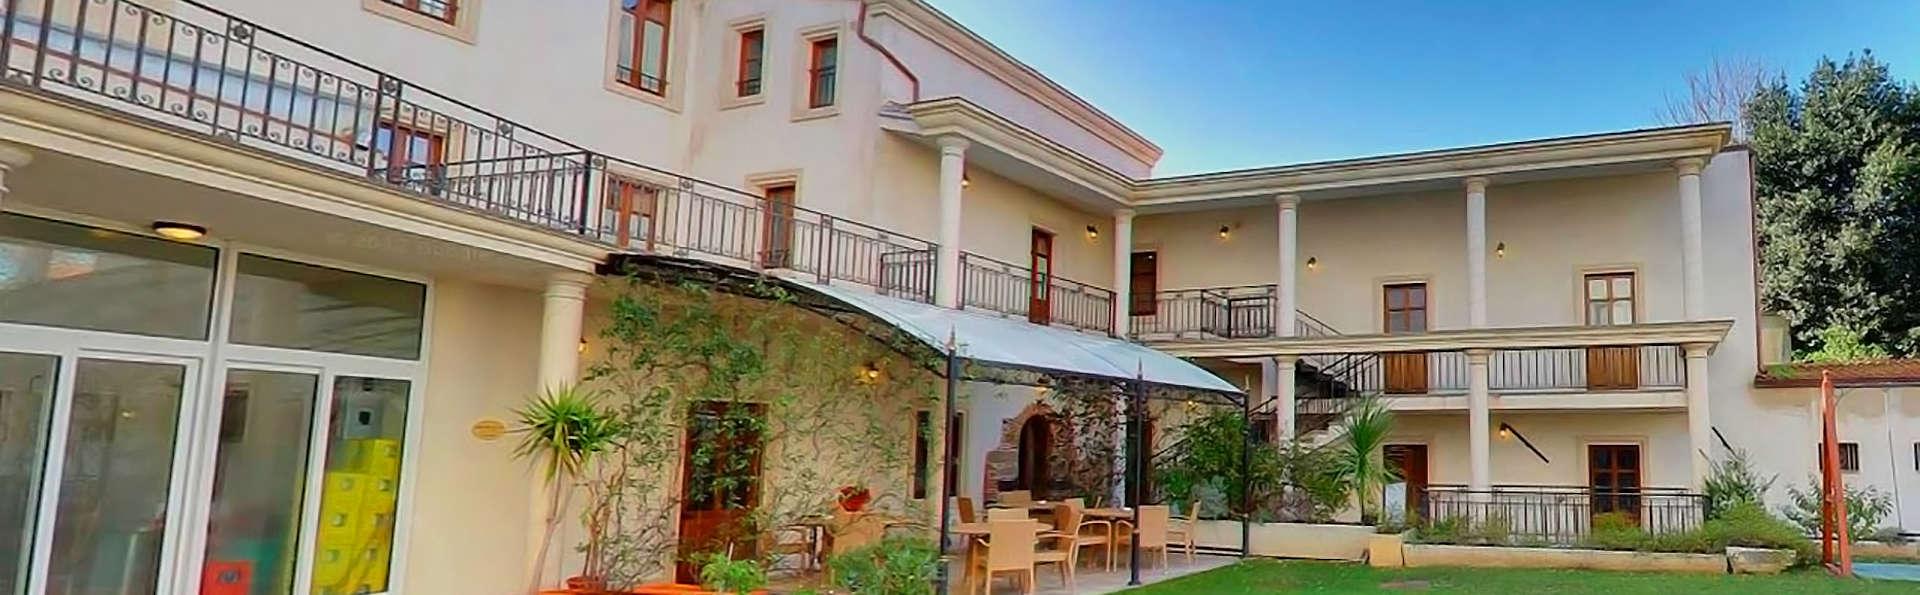 Mariano IV Palace Hotel - edit_GARDEN-1.jpg